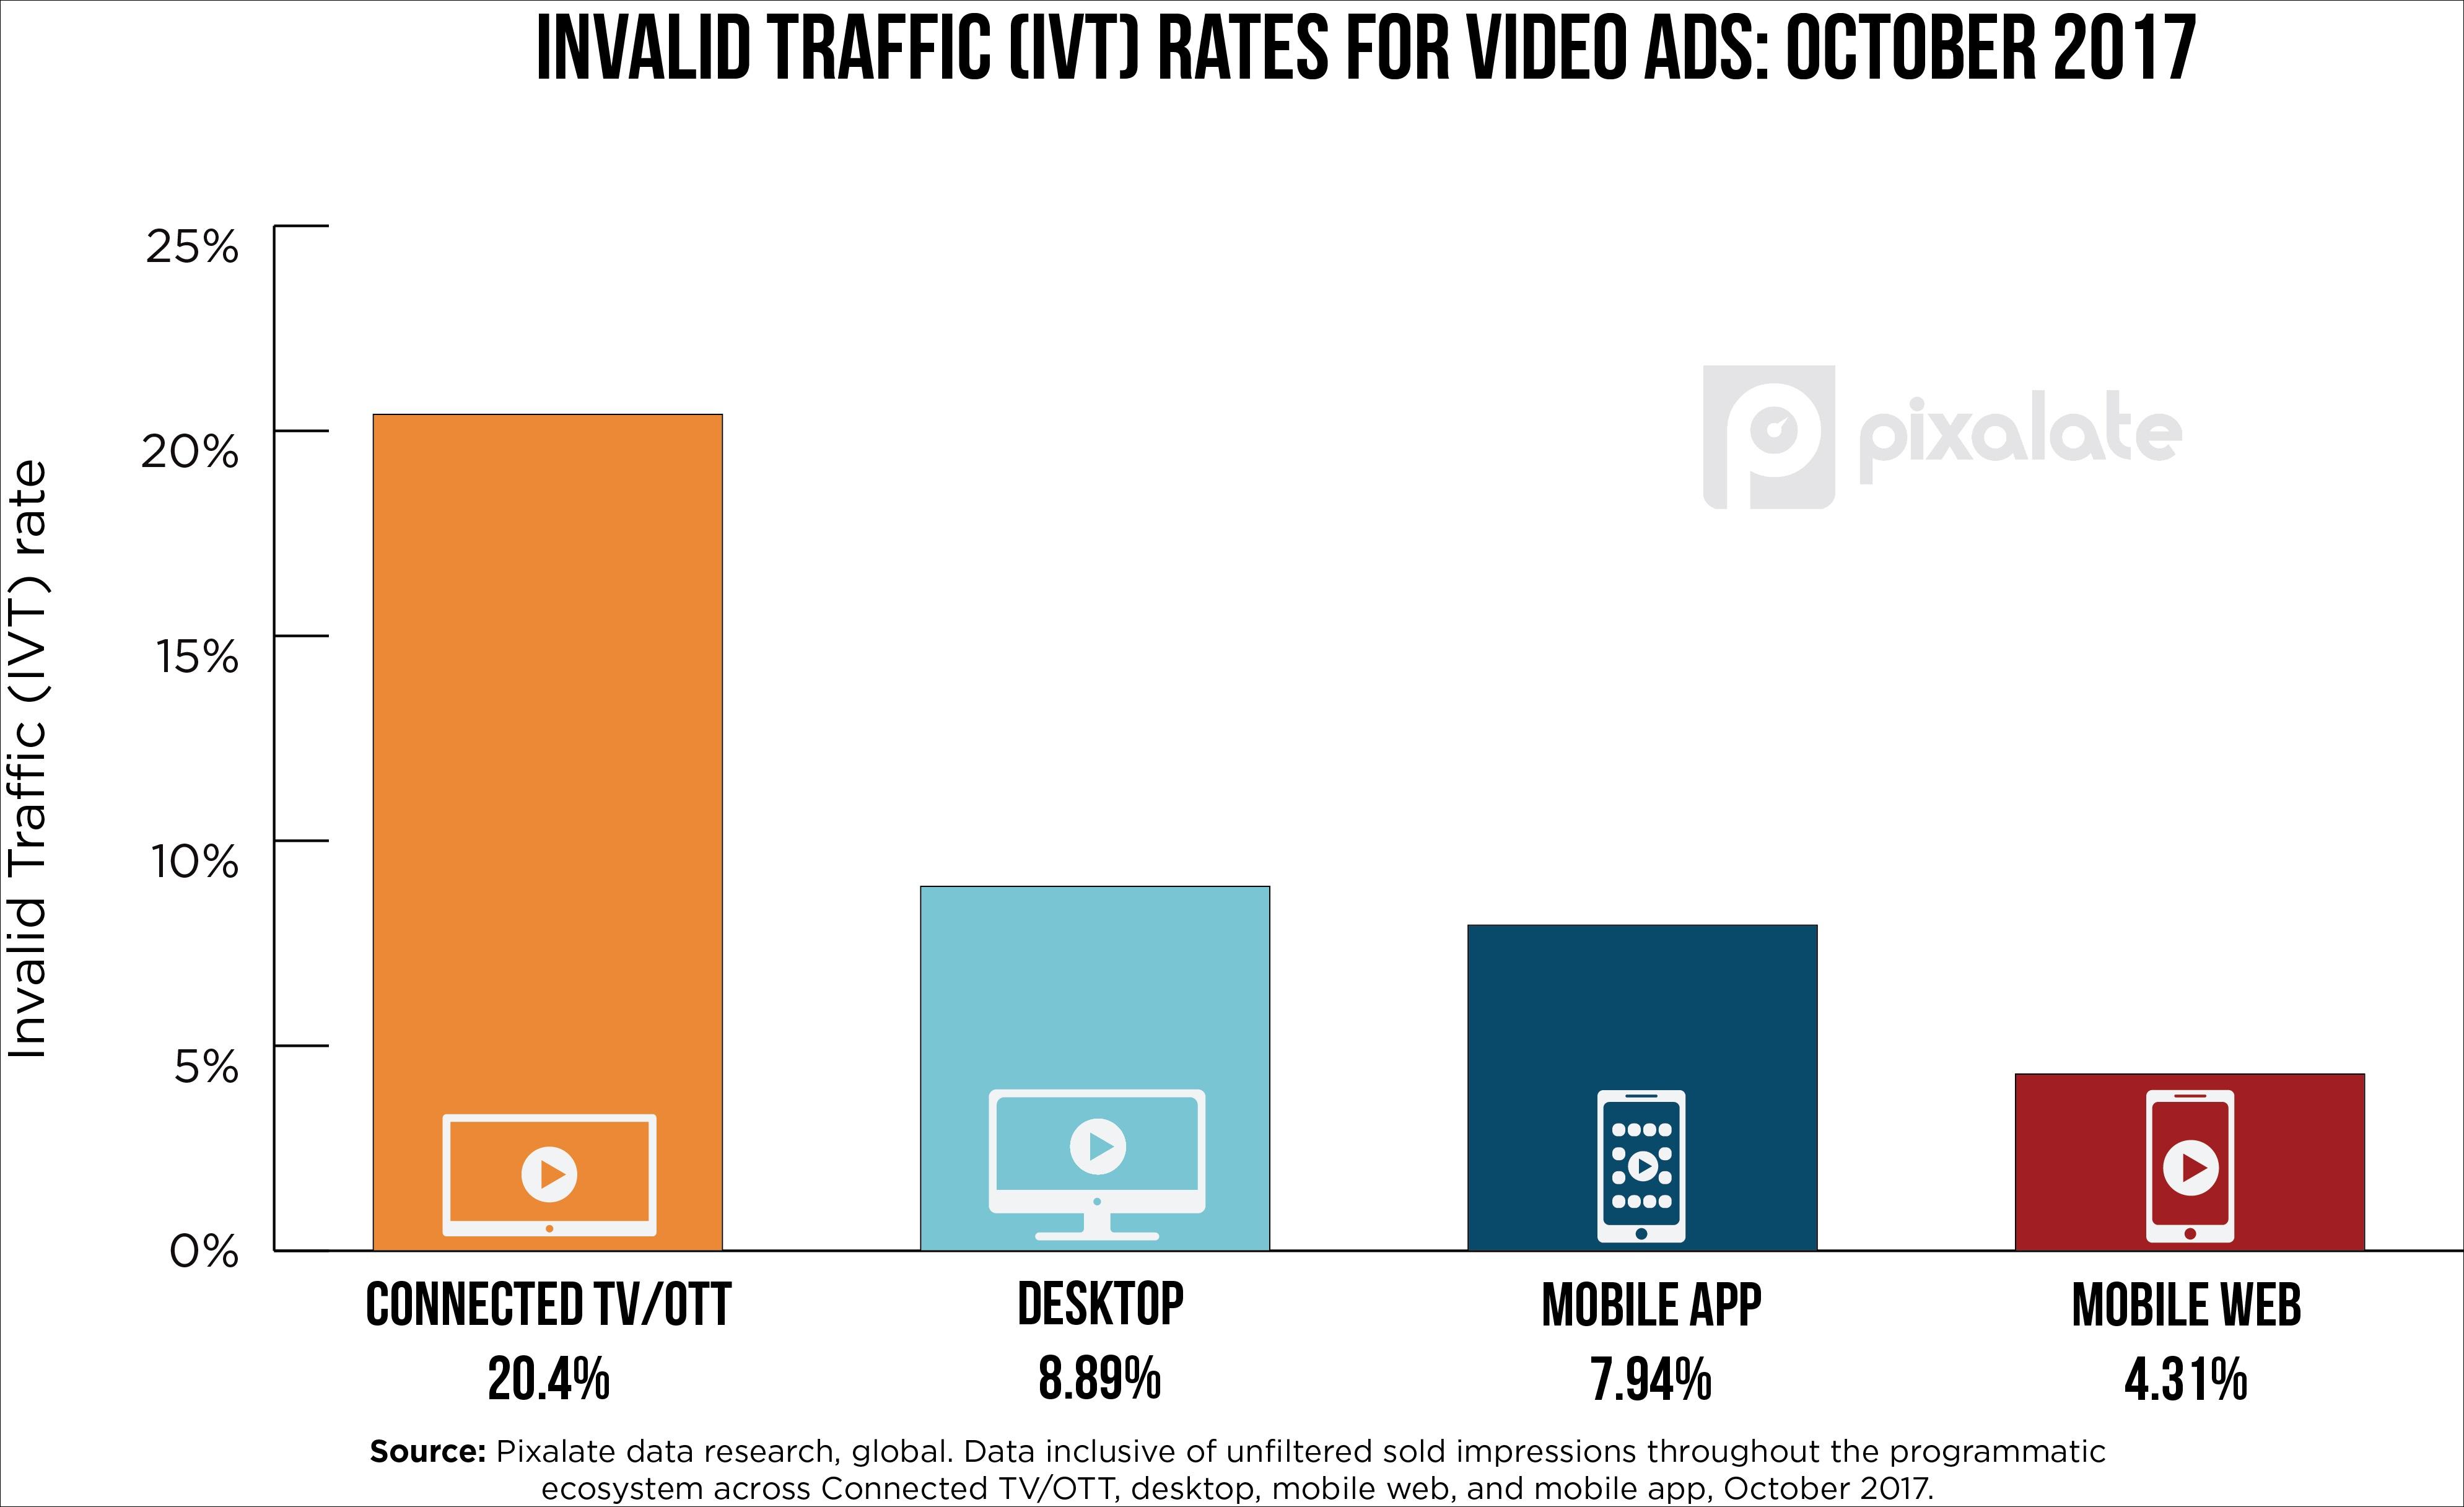 October-video-IVT-rates-Pixalate-digiday.jpg